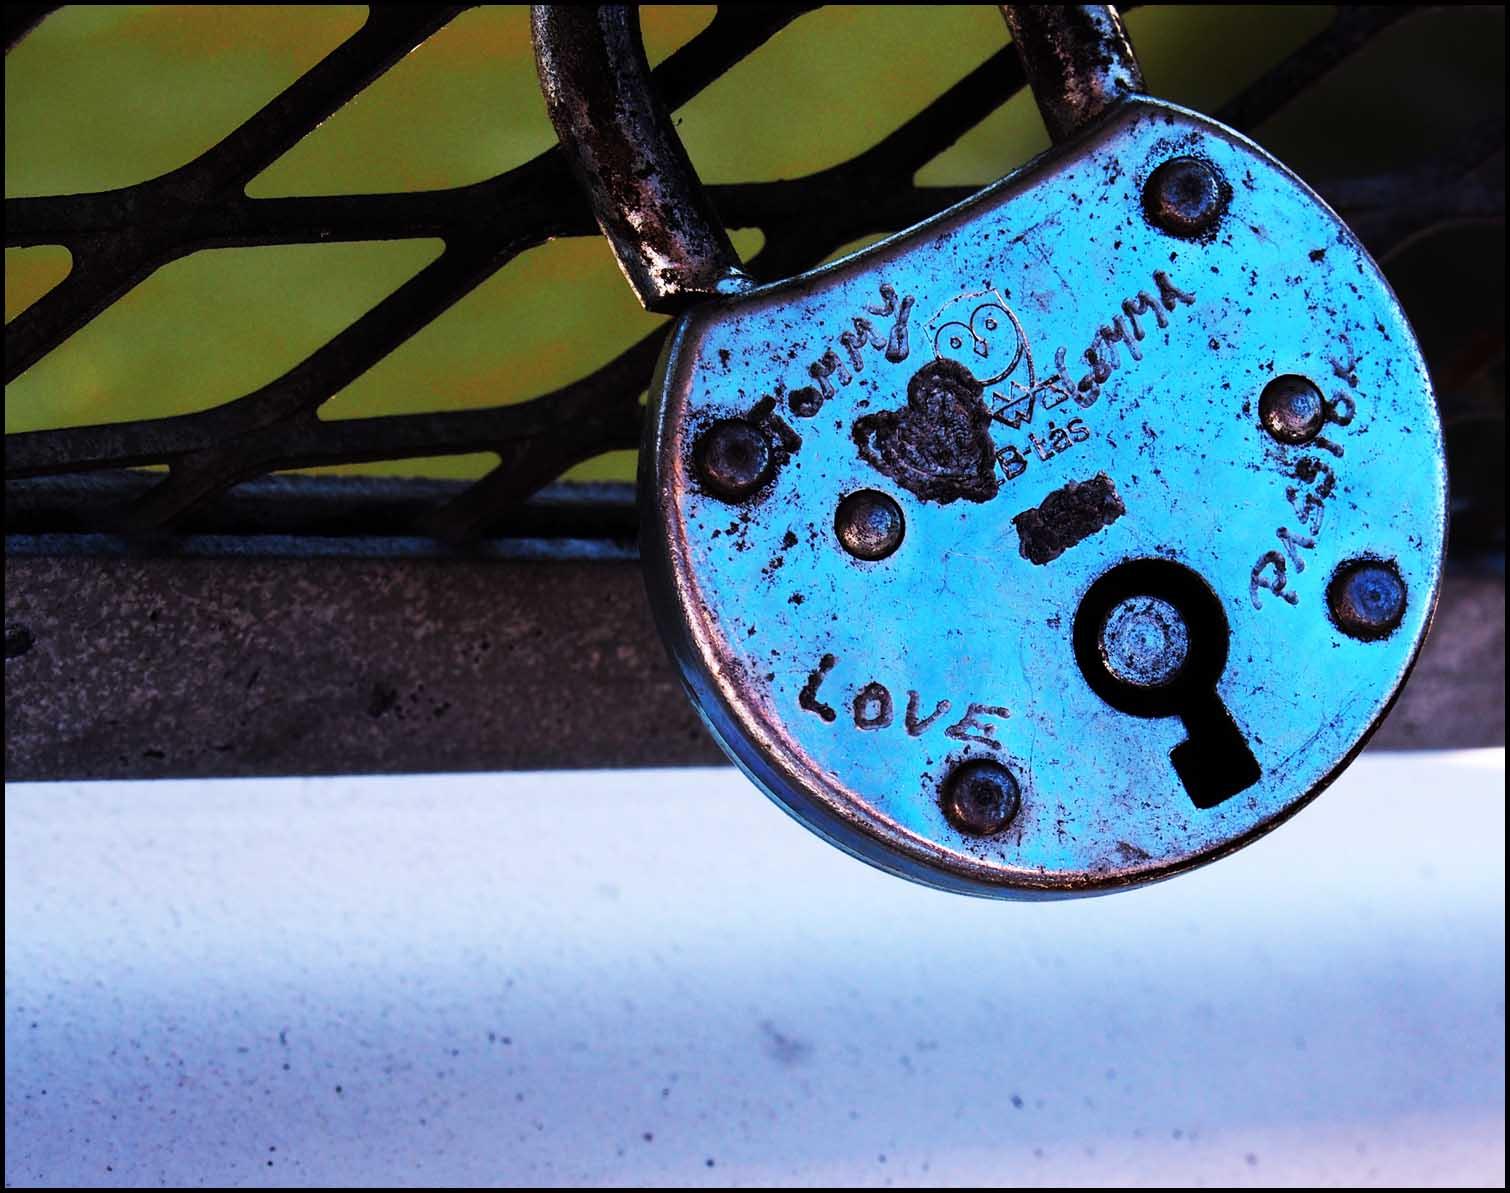 'Love' padlock, Helsinki